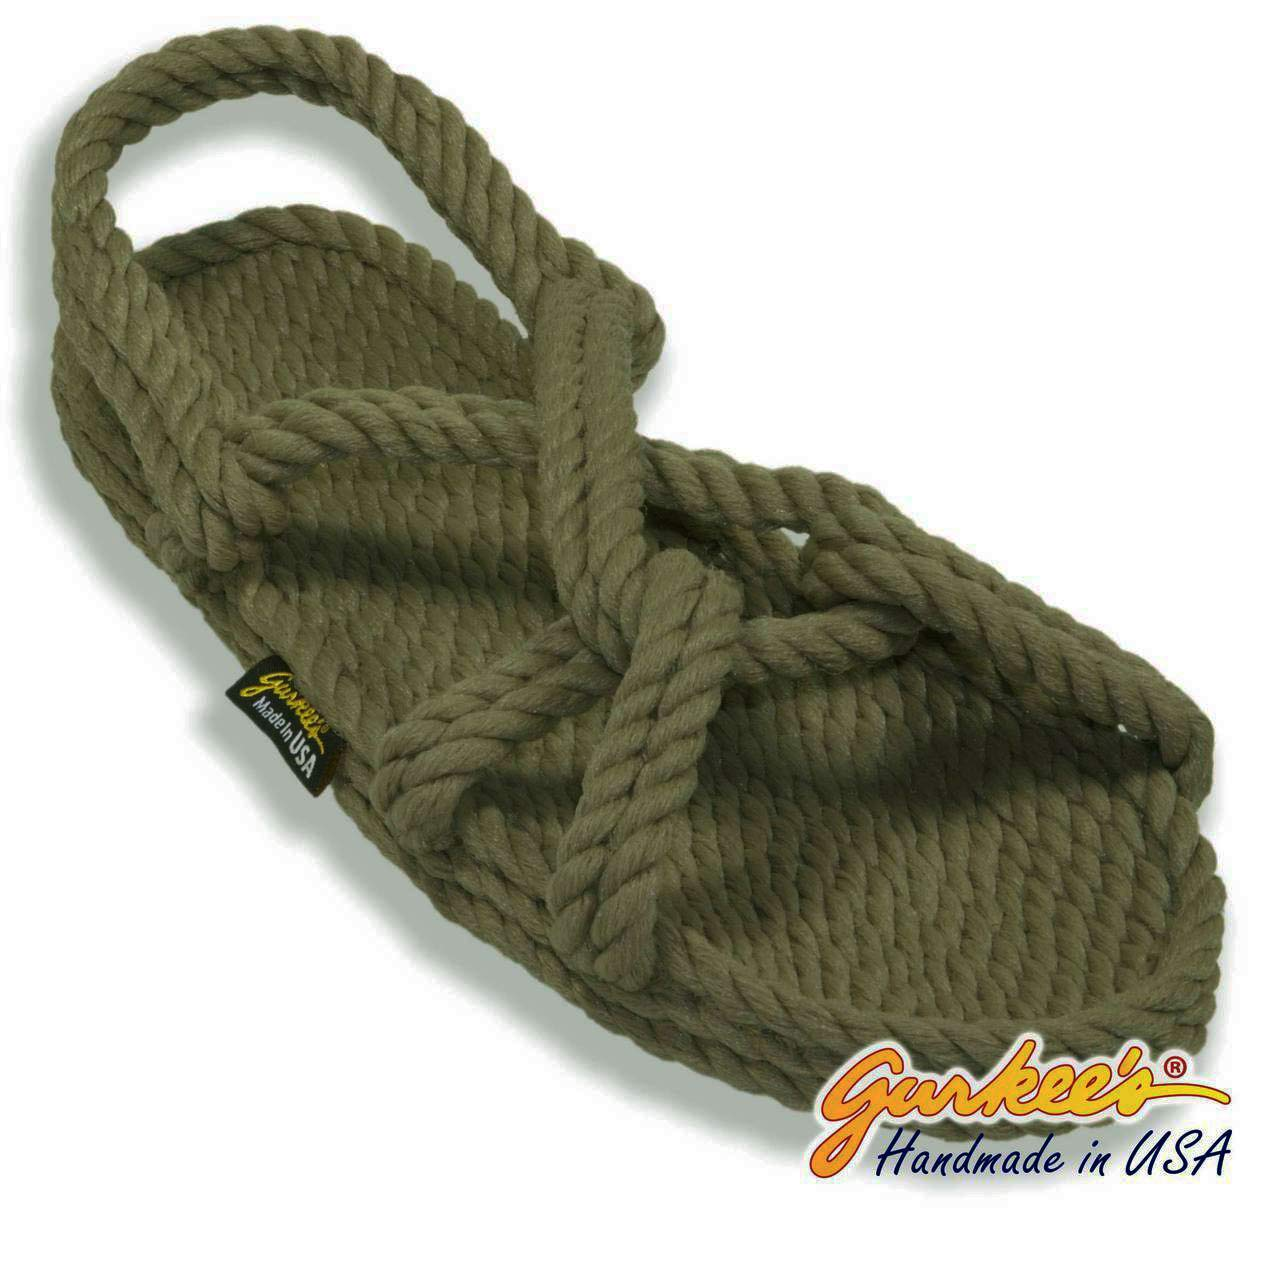 b398d04a8c6500 Gurkees rope sandals mens barbados style sandals jpg 1280x1280 His rope  sandals